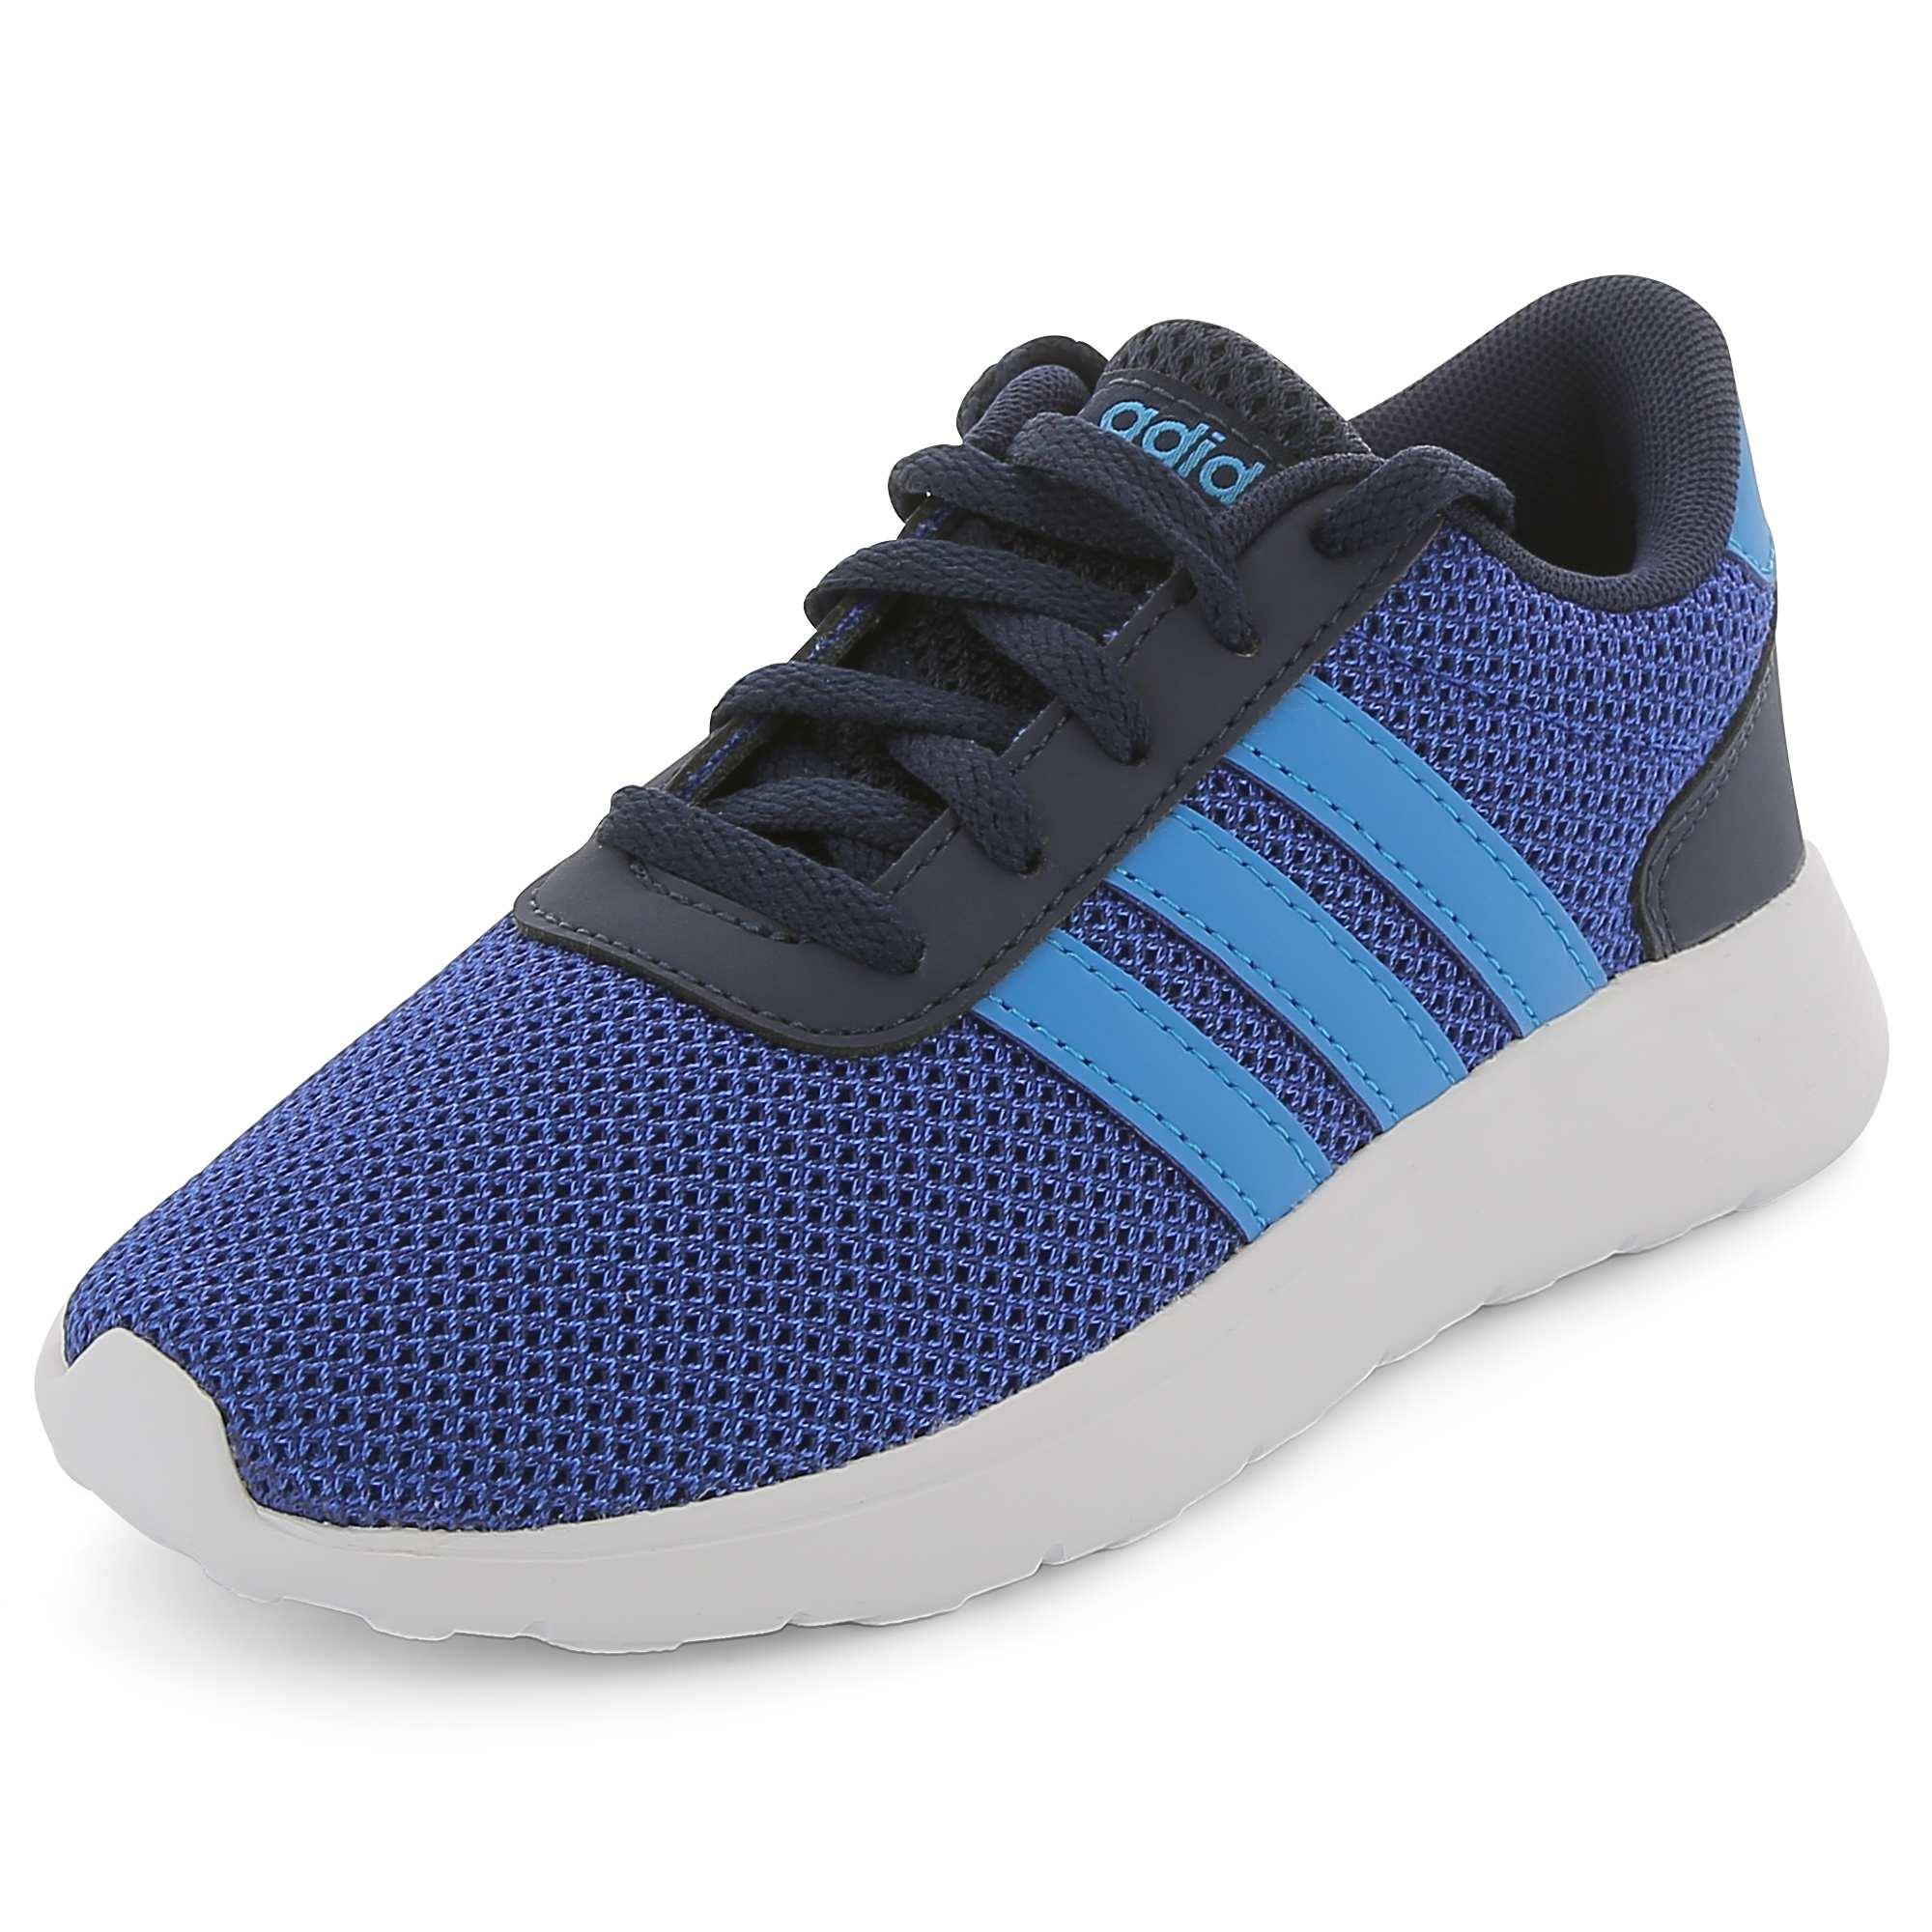 save off f41dc 1fe96 Zapatillas Adidas Lite Racer Cln K H4G9uRO